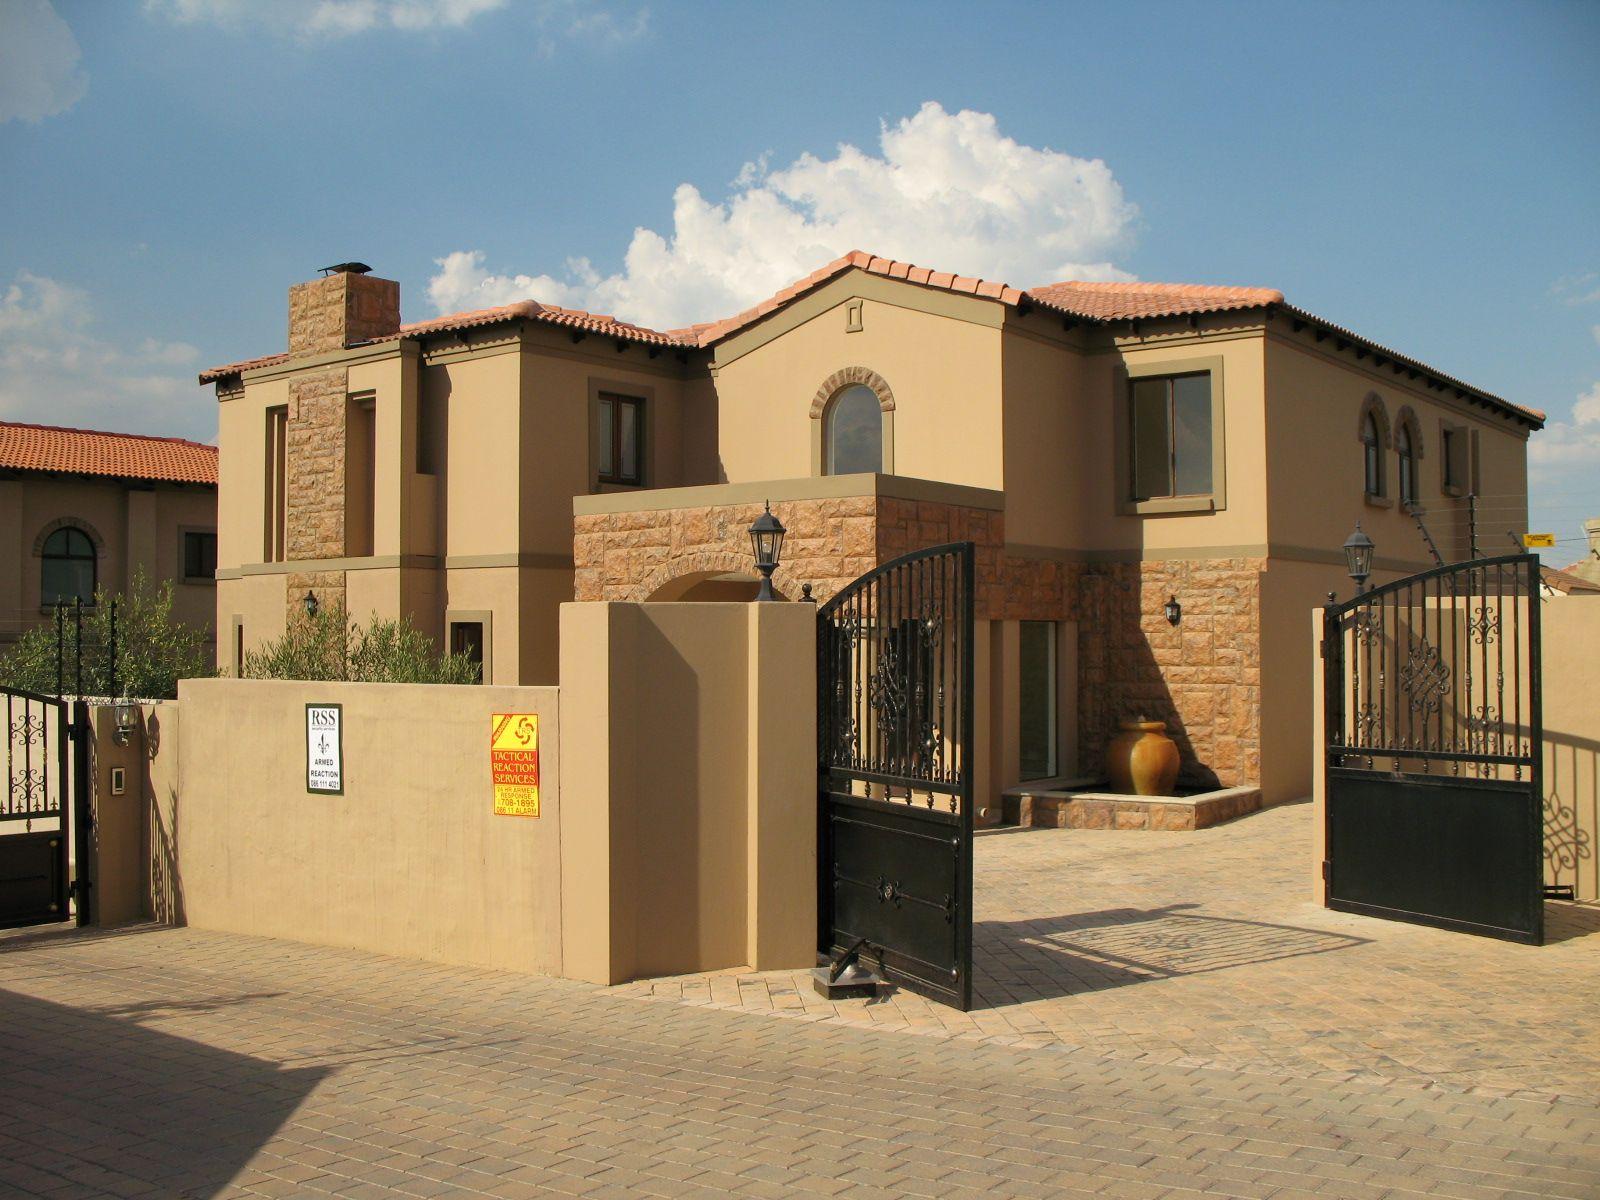 tuscan style home tuscan style home tuscan style tuscan style homes plans tuscan style homes fancy